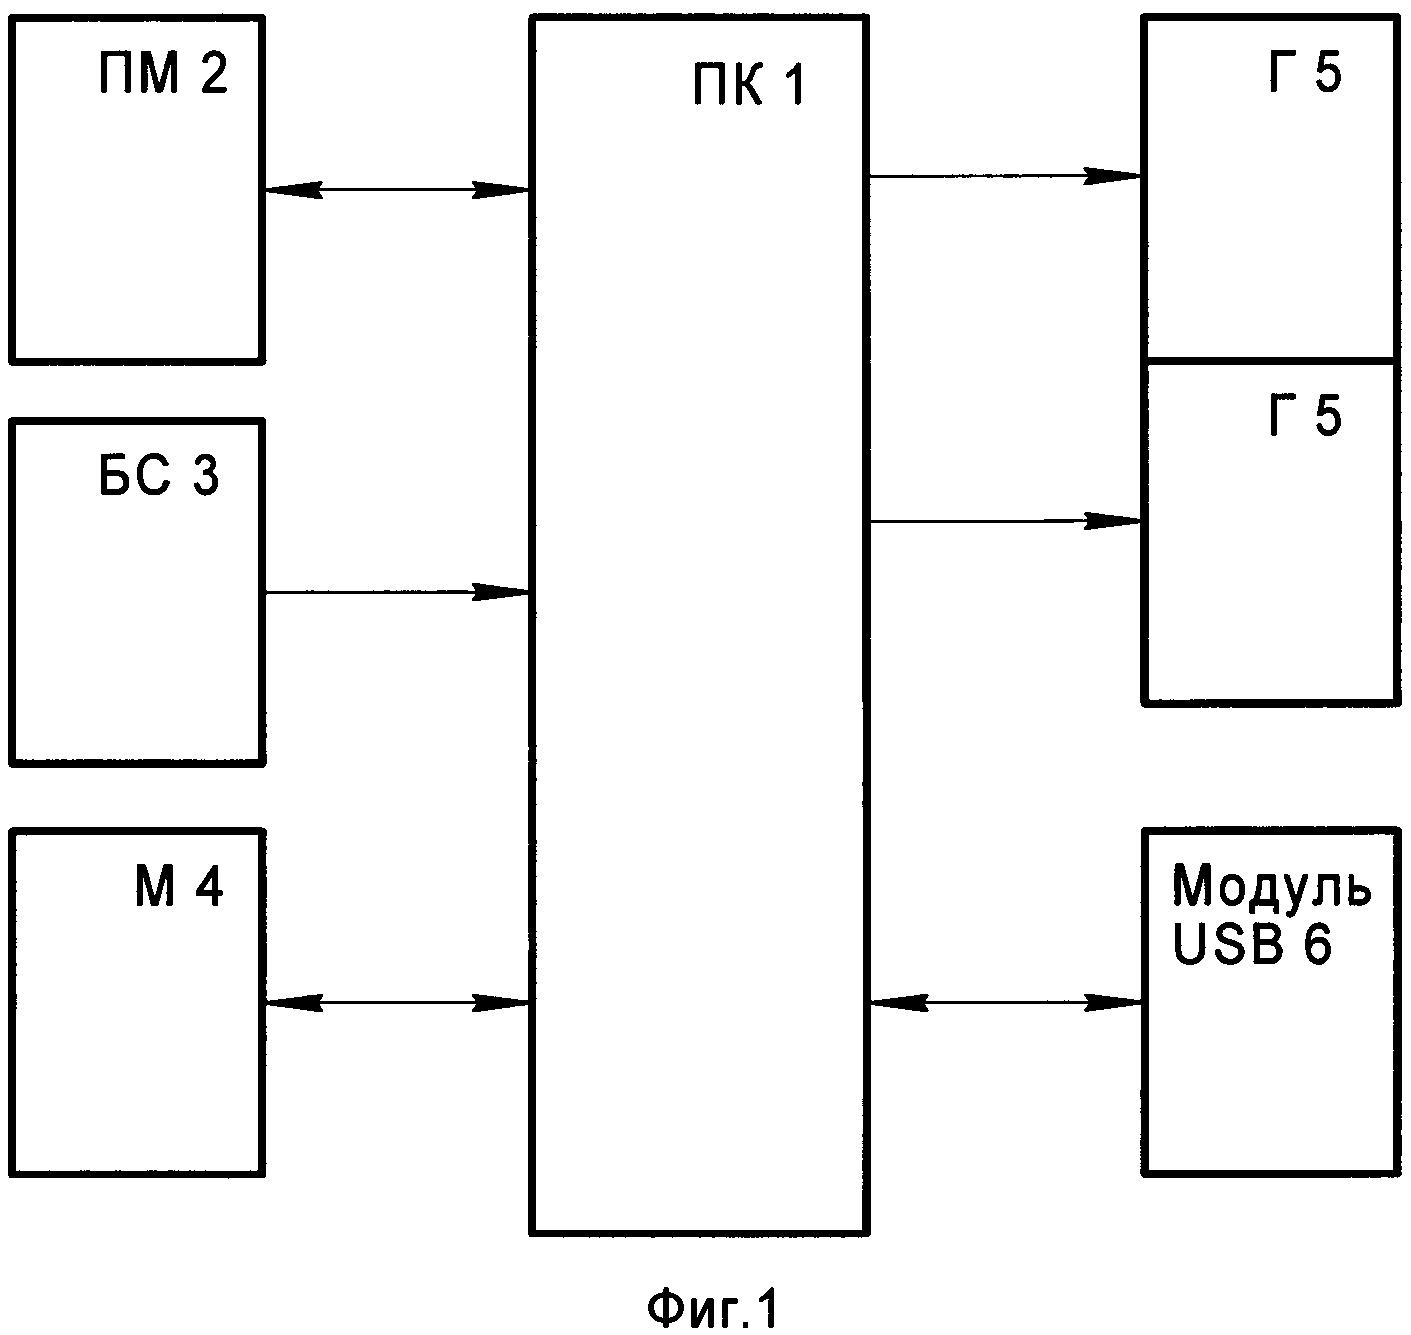 Программно-аппаратные средства комплекса топопривязки и навигации